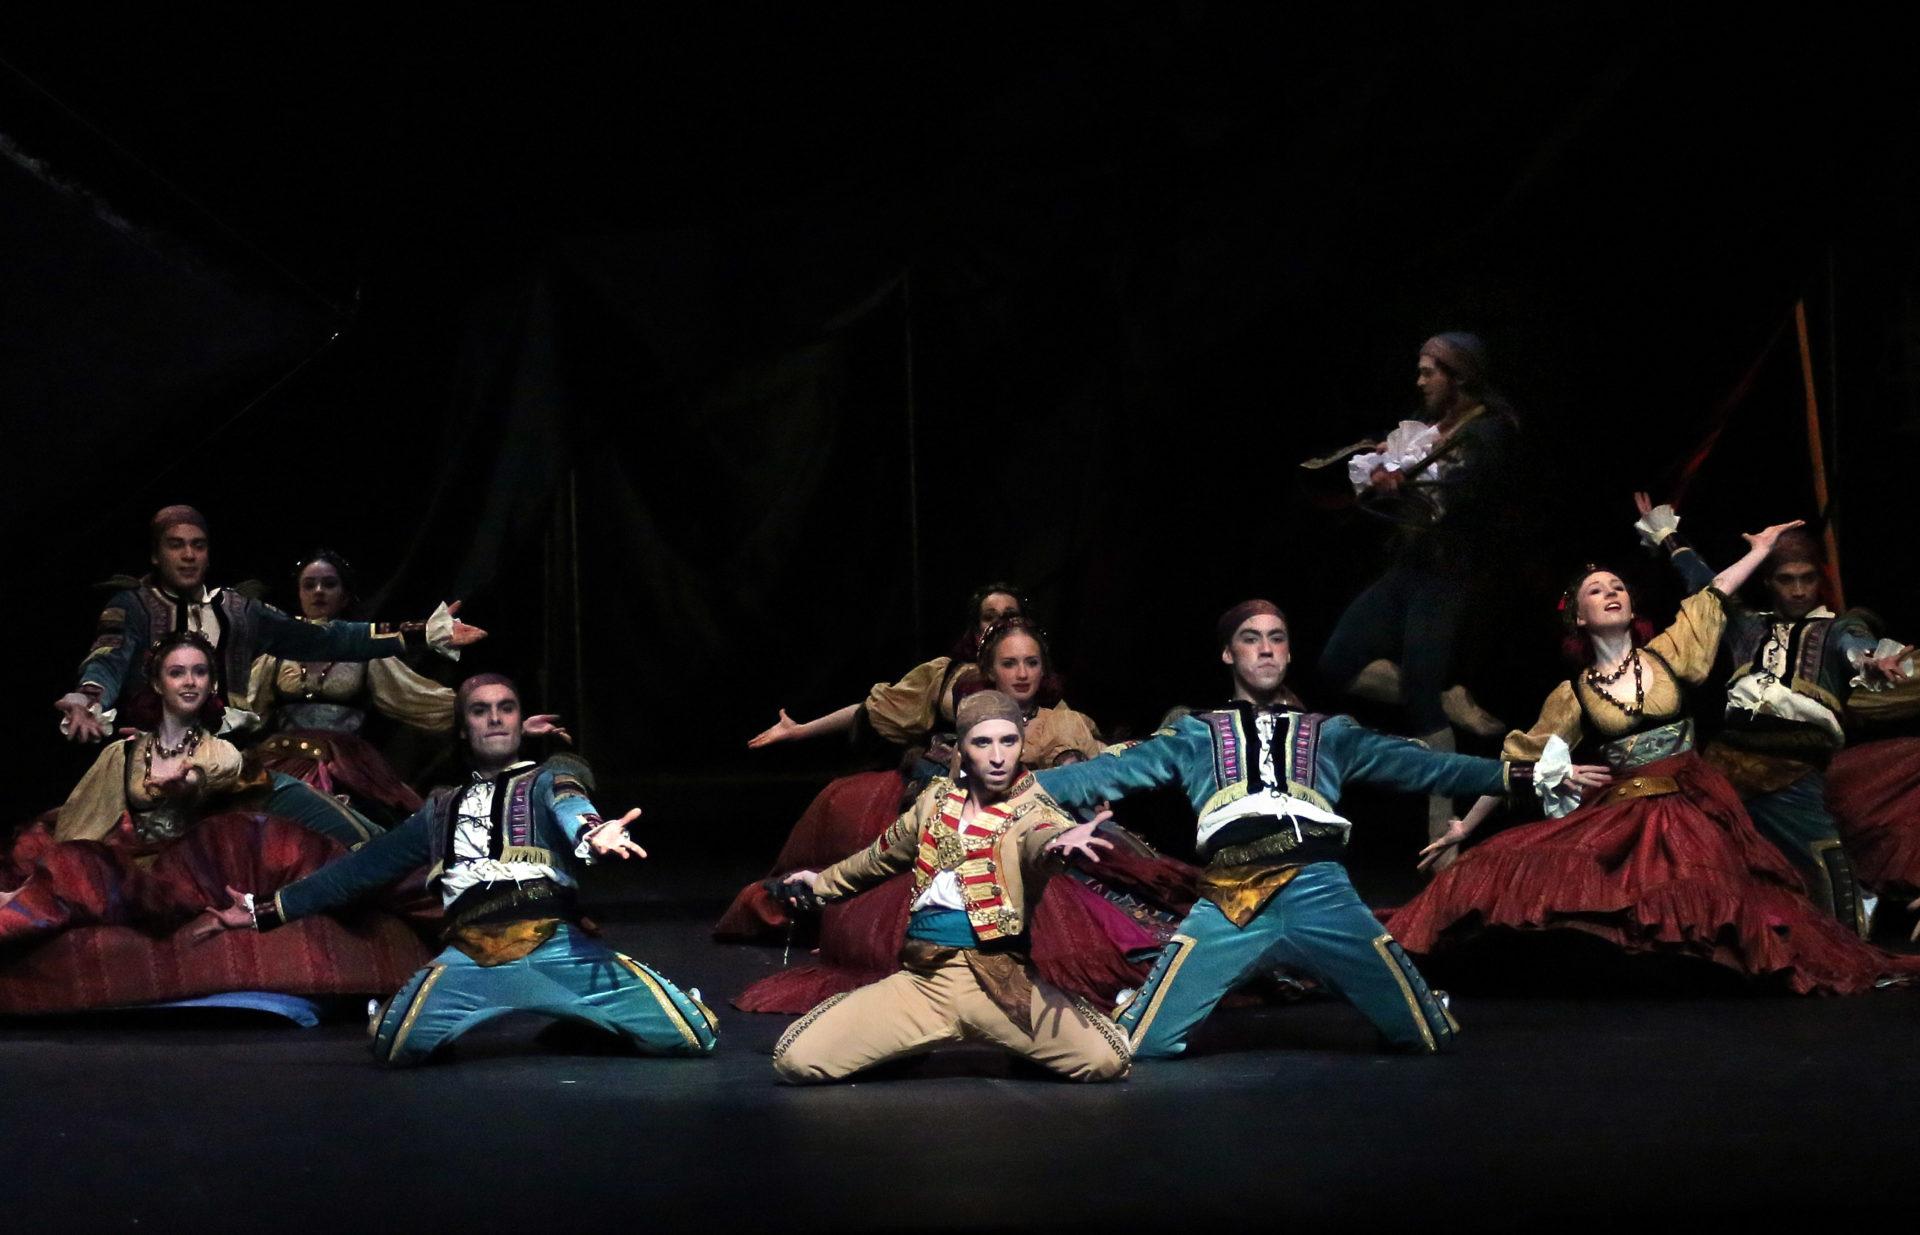 Don_Quixote_HH_Ballett_Foto_AnjaBeutler.de_349